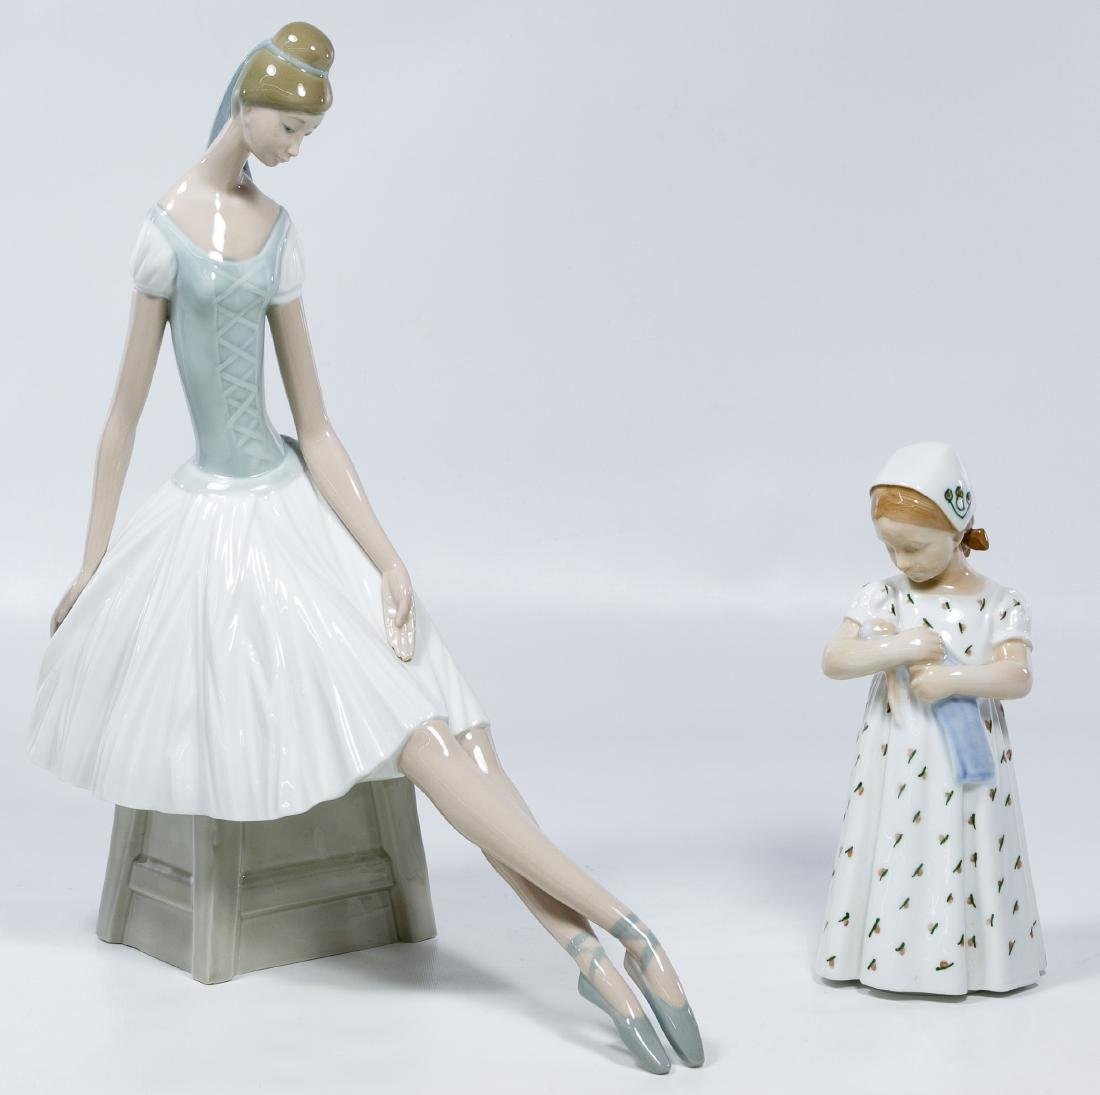 Nao and B&G Figurine Assortment